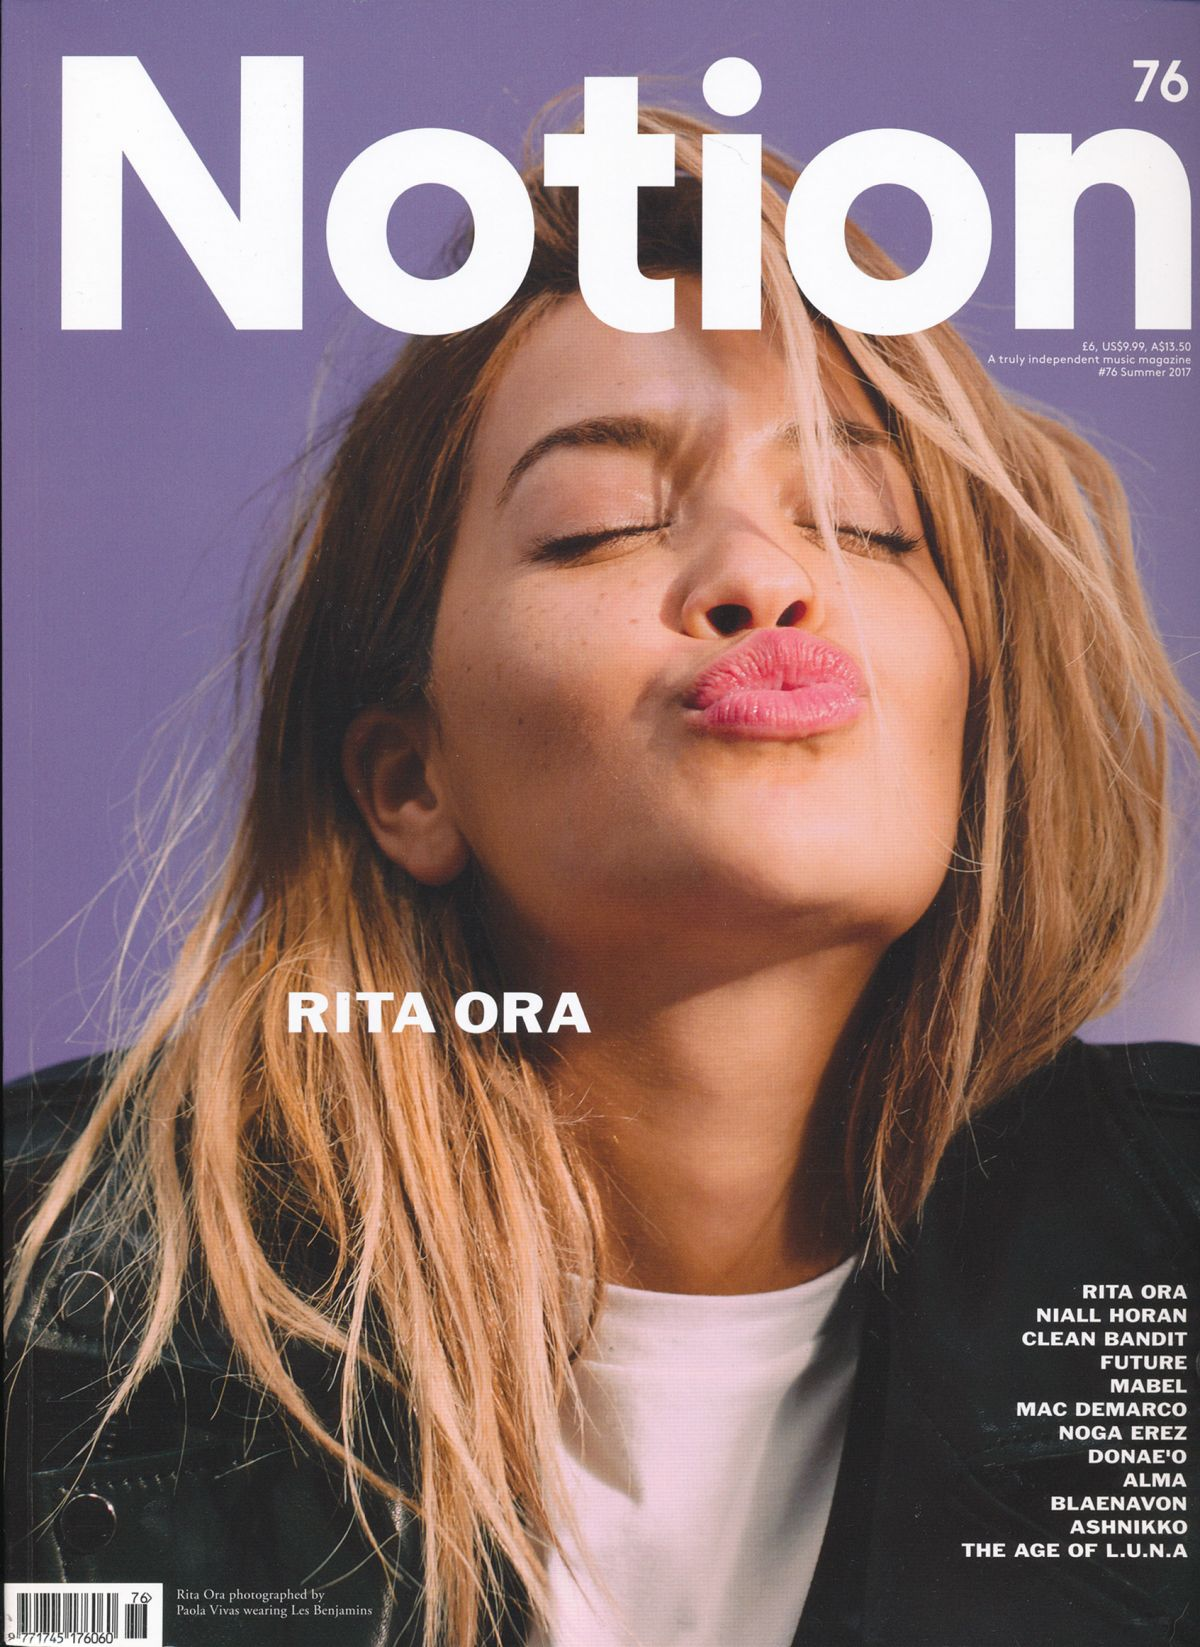 RIT ORA in Notion Magazinem, Issue 76